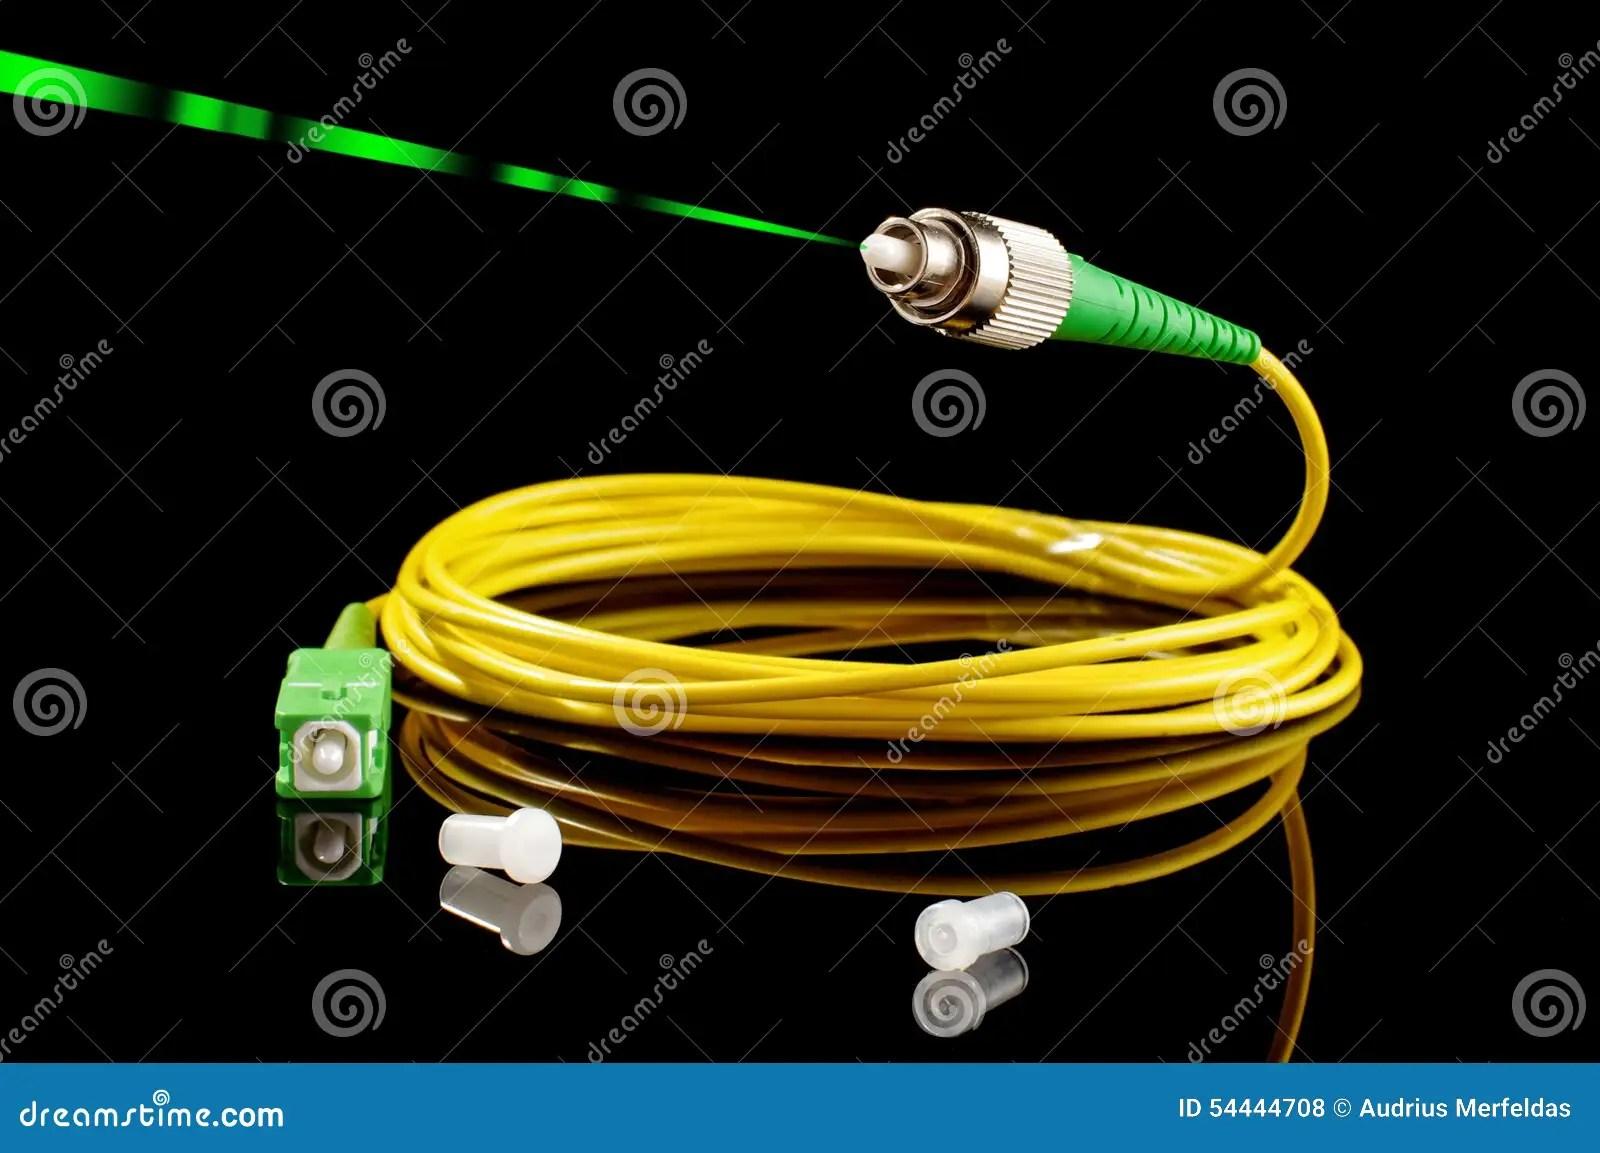 hight resolution of fiber optic wiring home wiring diagram expert fiber optic home wiring fiber optic home wiring